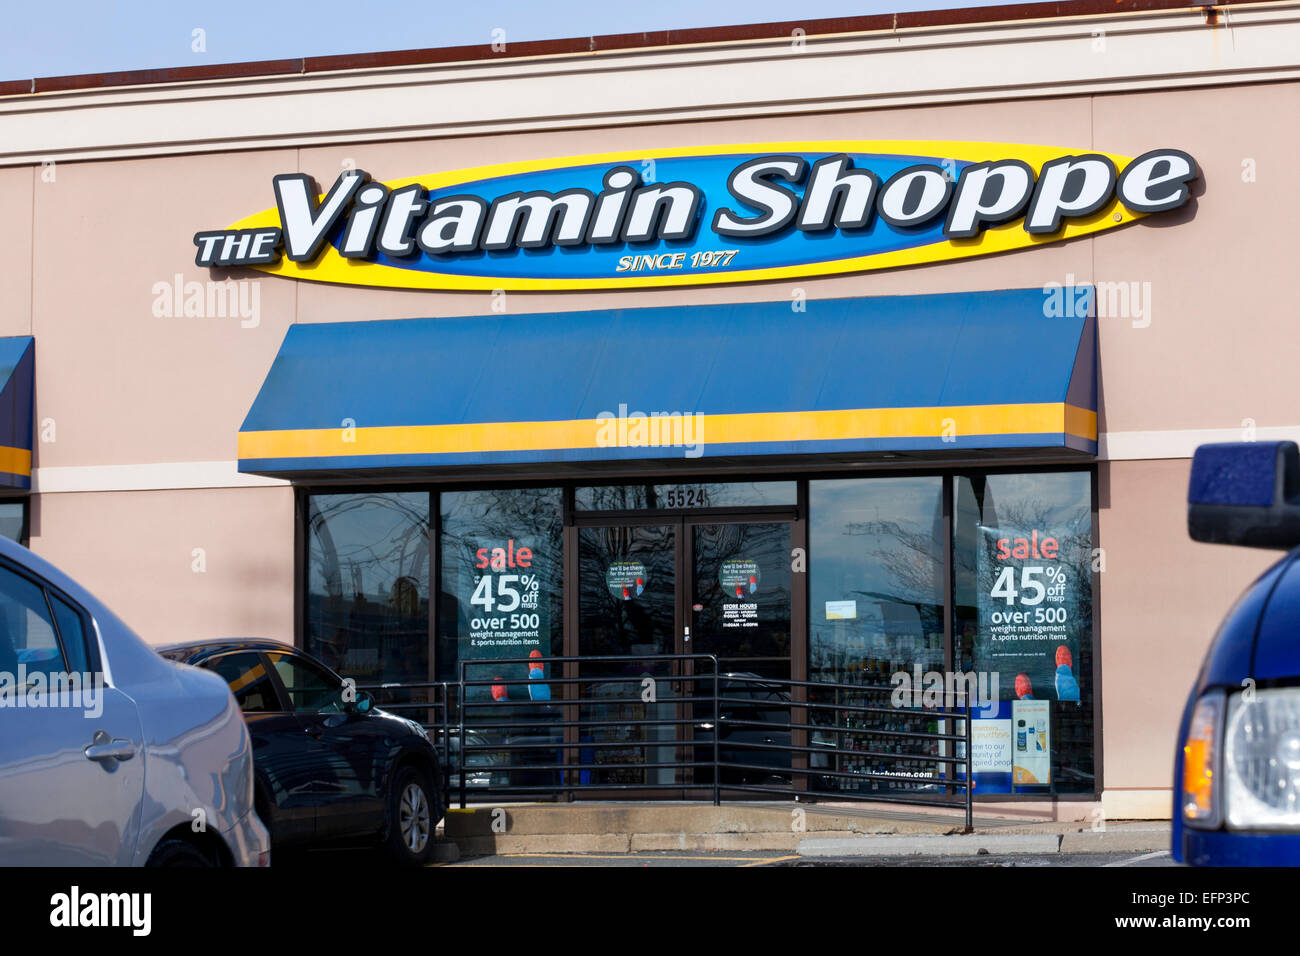 Vitamin Shoppe Schaufenster - USA Stockbild